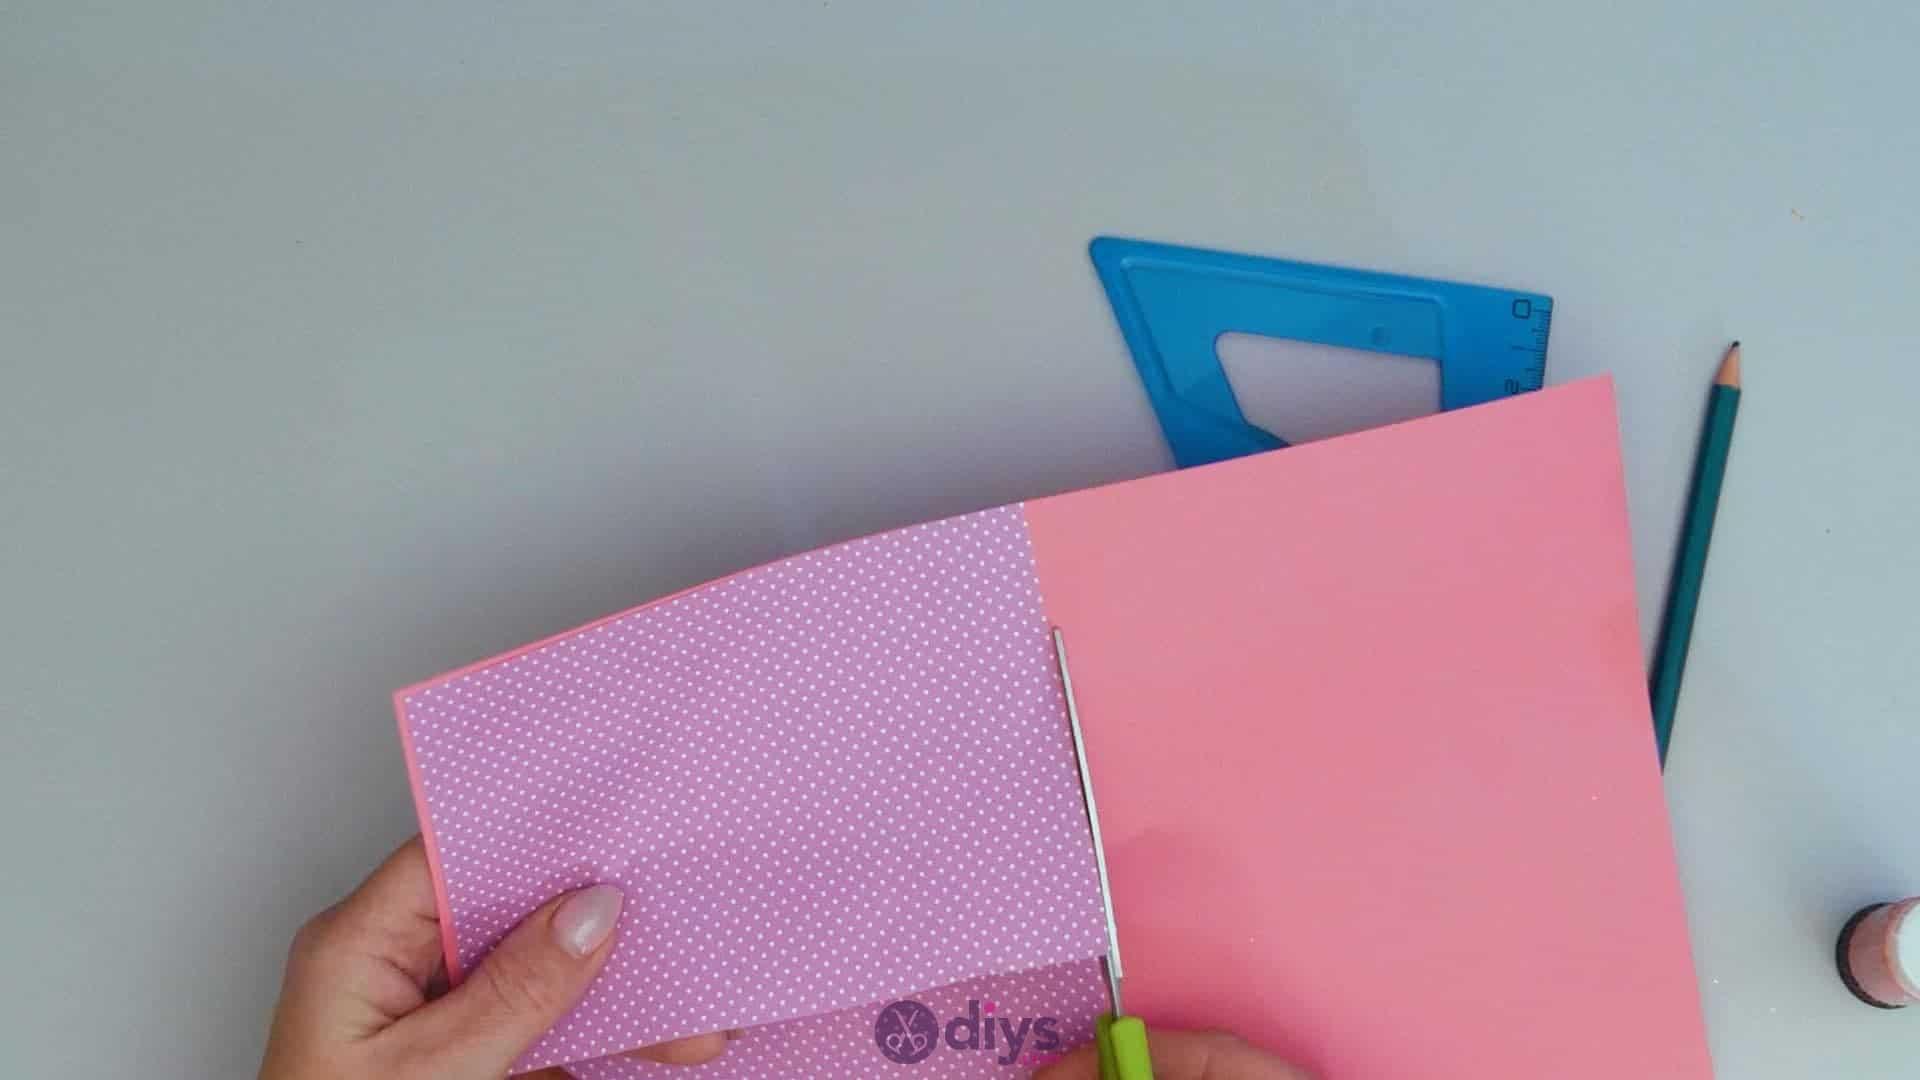 Diy lipstick gift card step 3